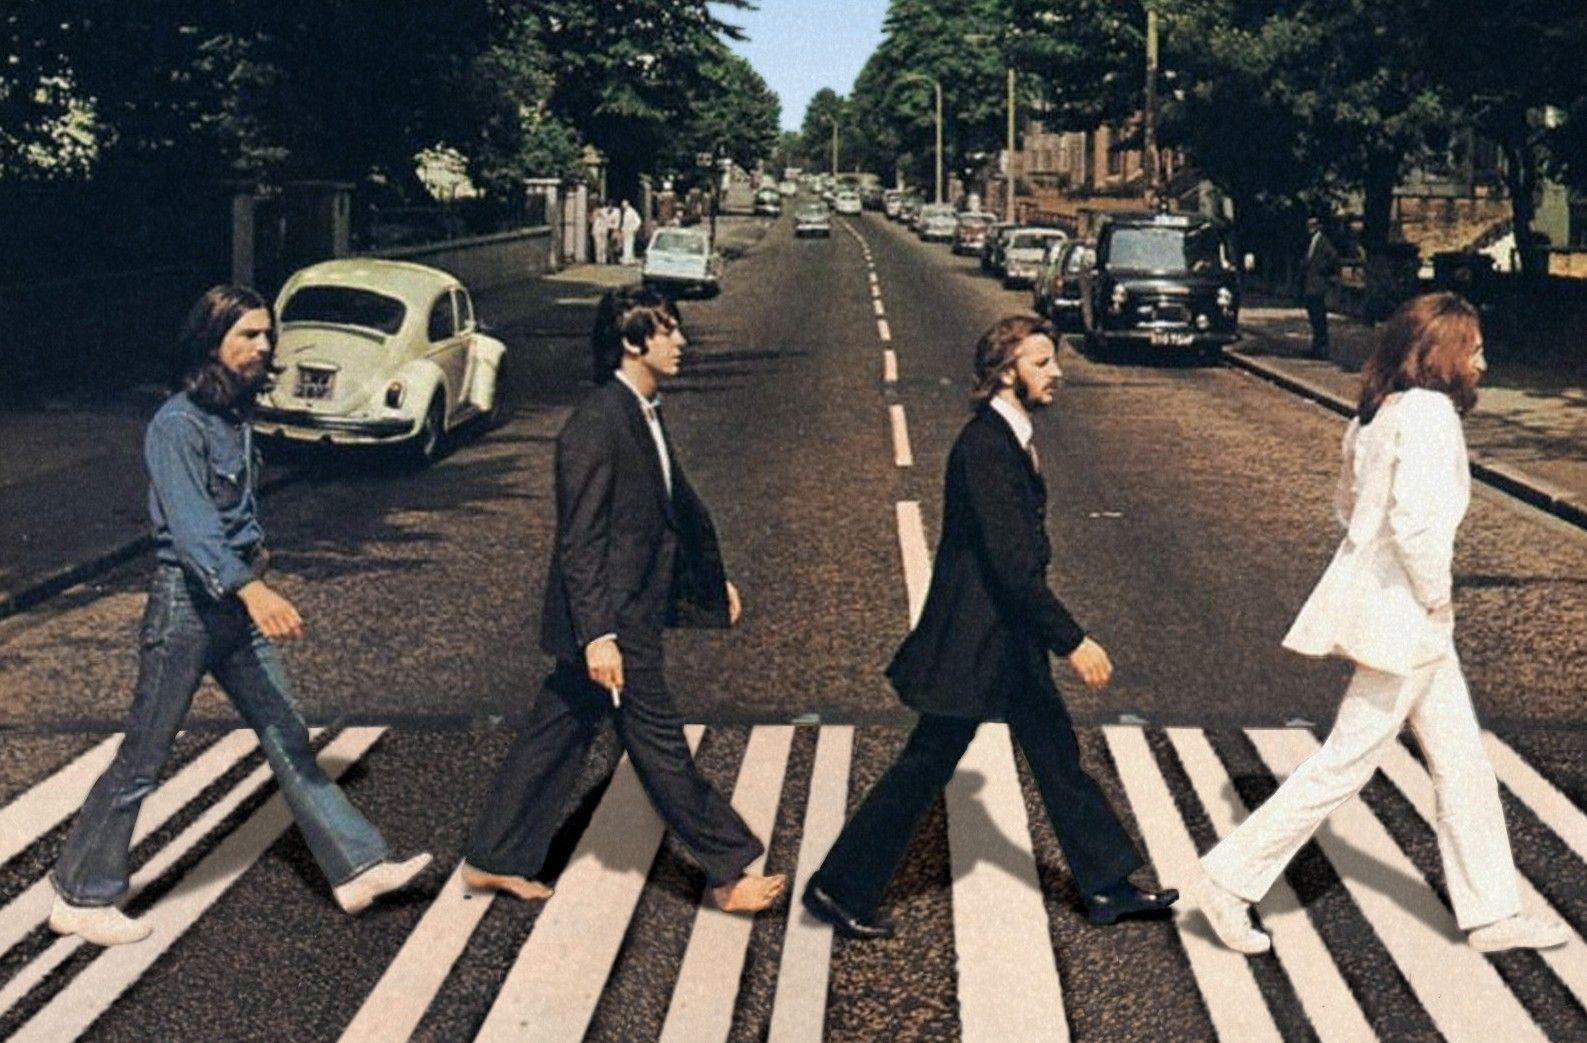 Abbey road album cover the beatles pinterest abbey road